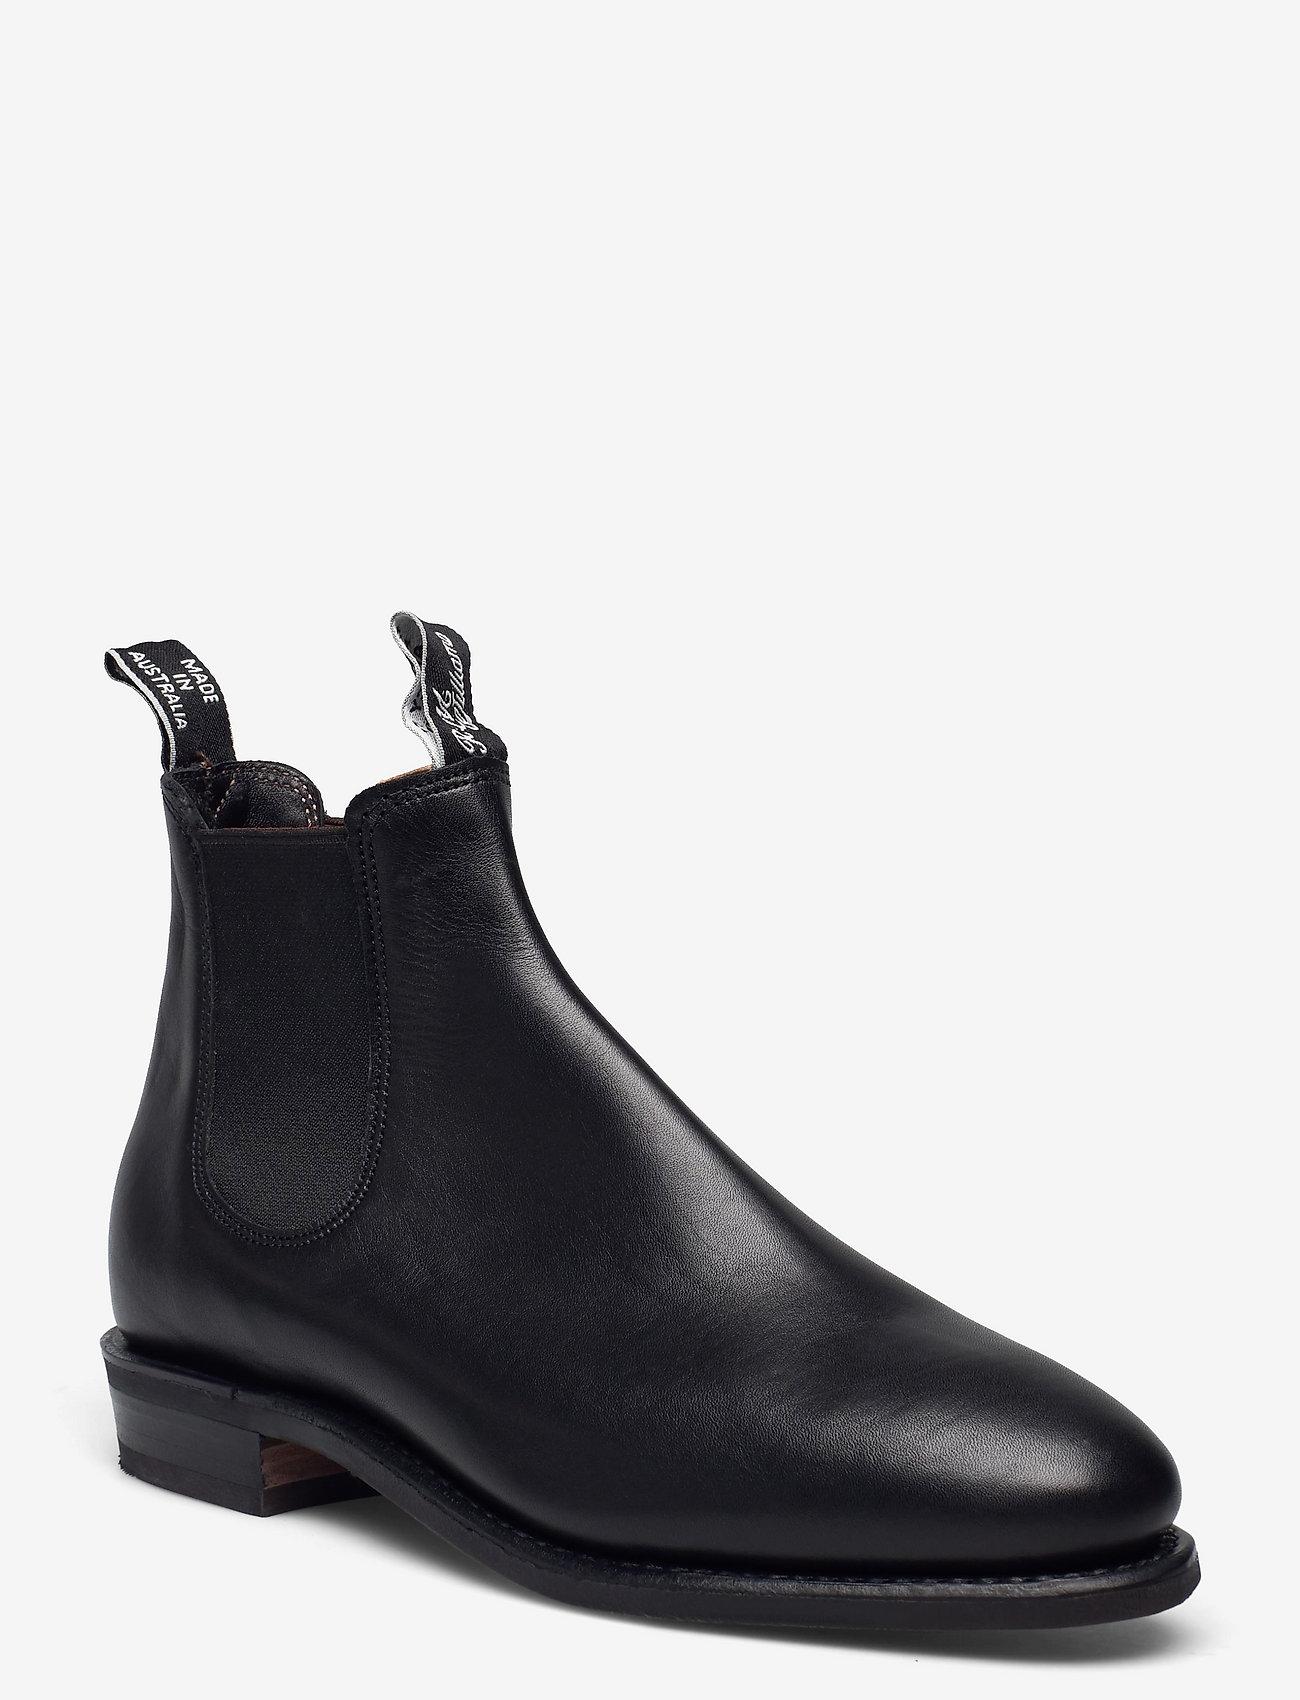 R.M. Williams - Adelaide D Yearling Black 6+ - schoenen - black - 0